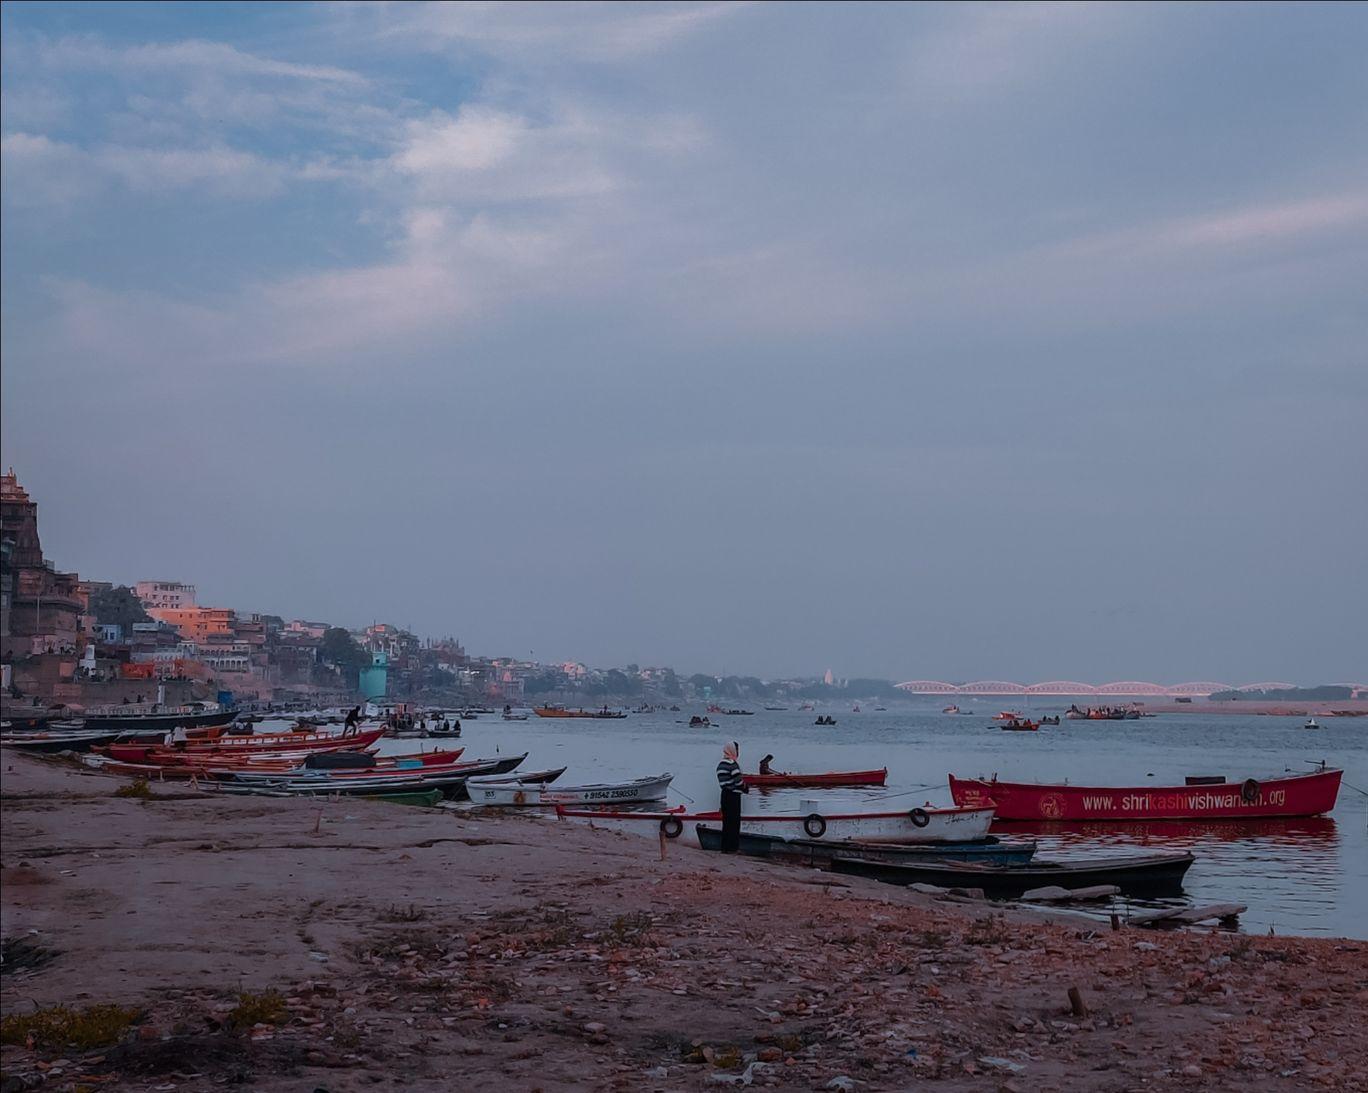 Photo of Varanasi By Tripurari Pandey